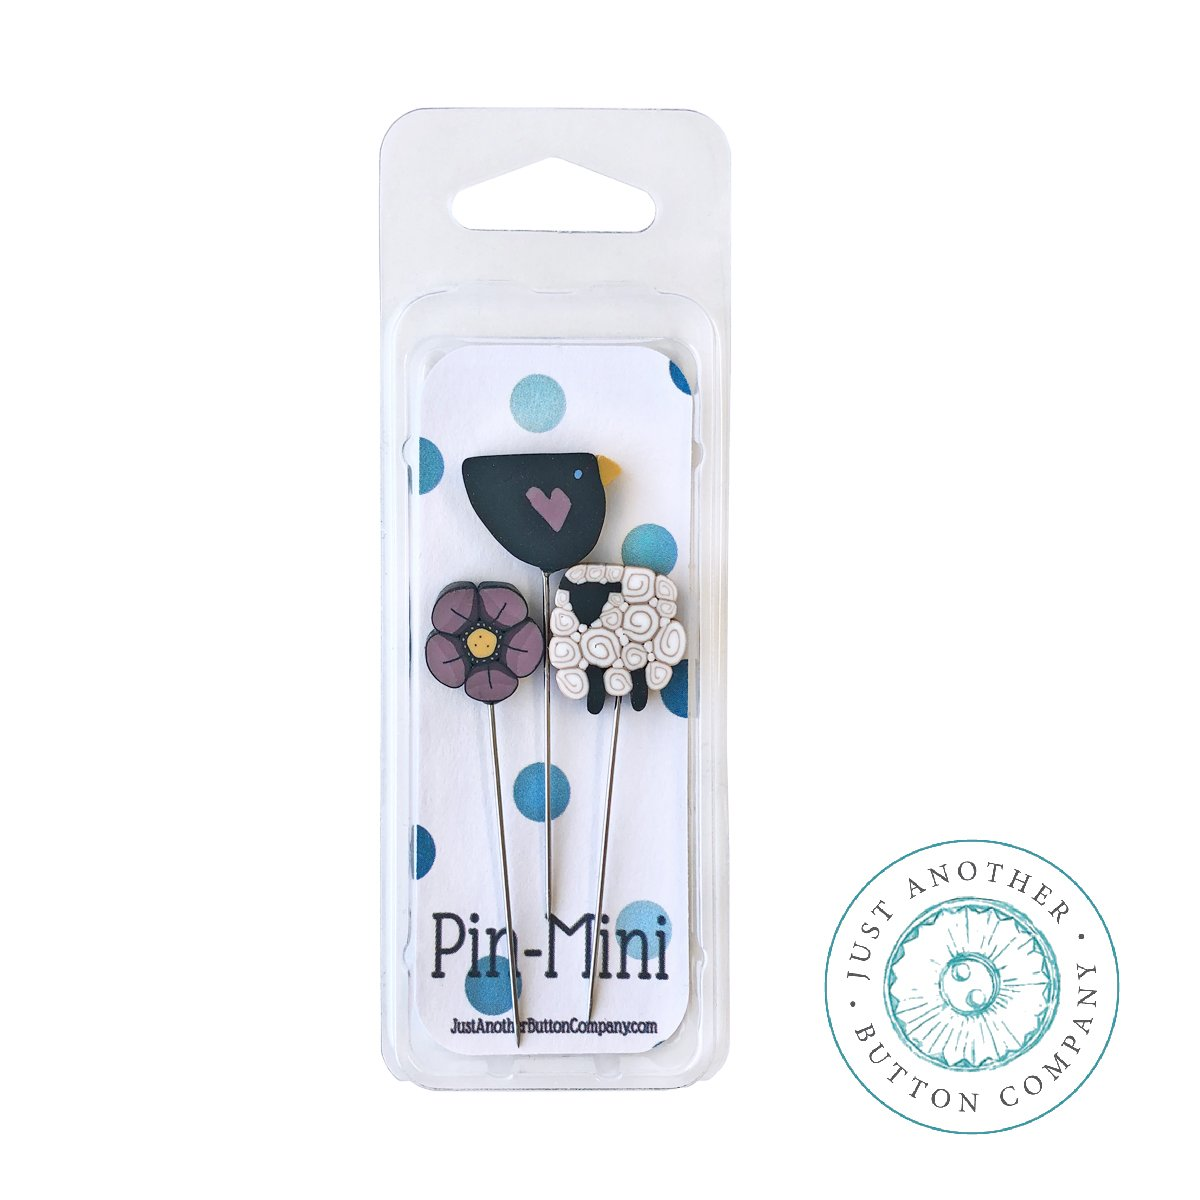 JABCO Pin Mini jpm429 - Bless the Fields for Shepherd's Bush Little Blessings Pincushion